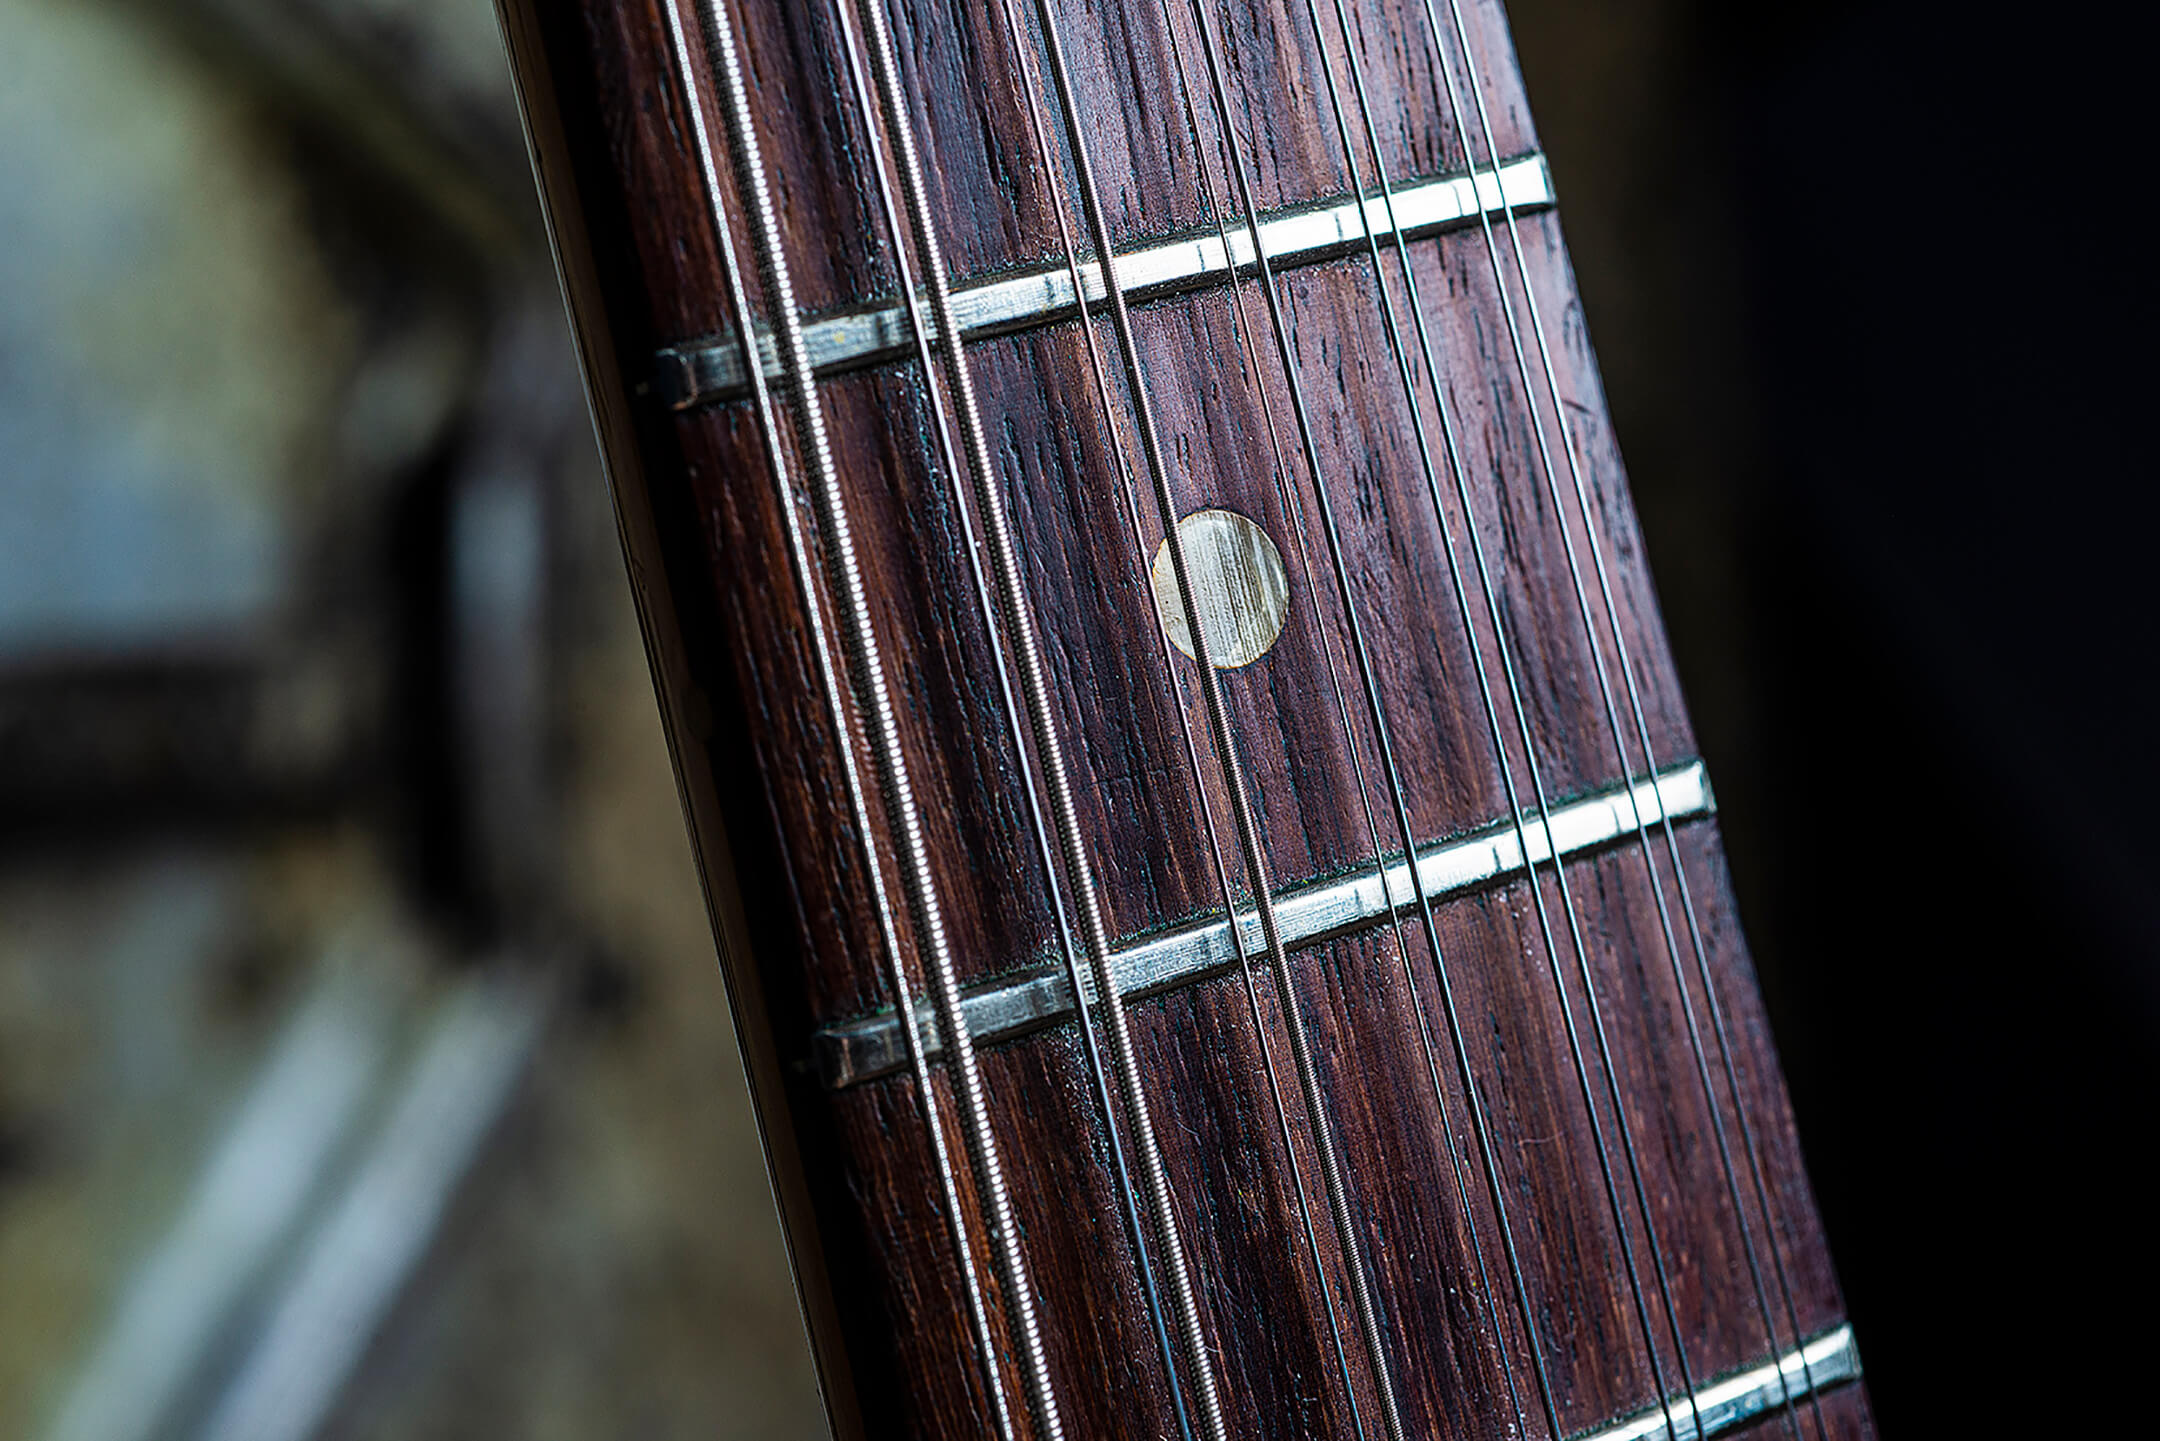 Thurston Moore's Fender Electric XIII Fretboard